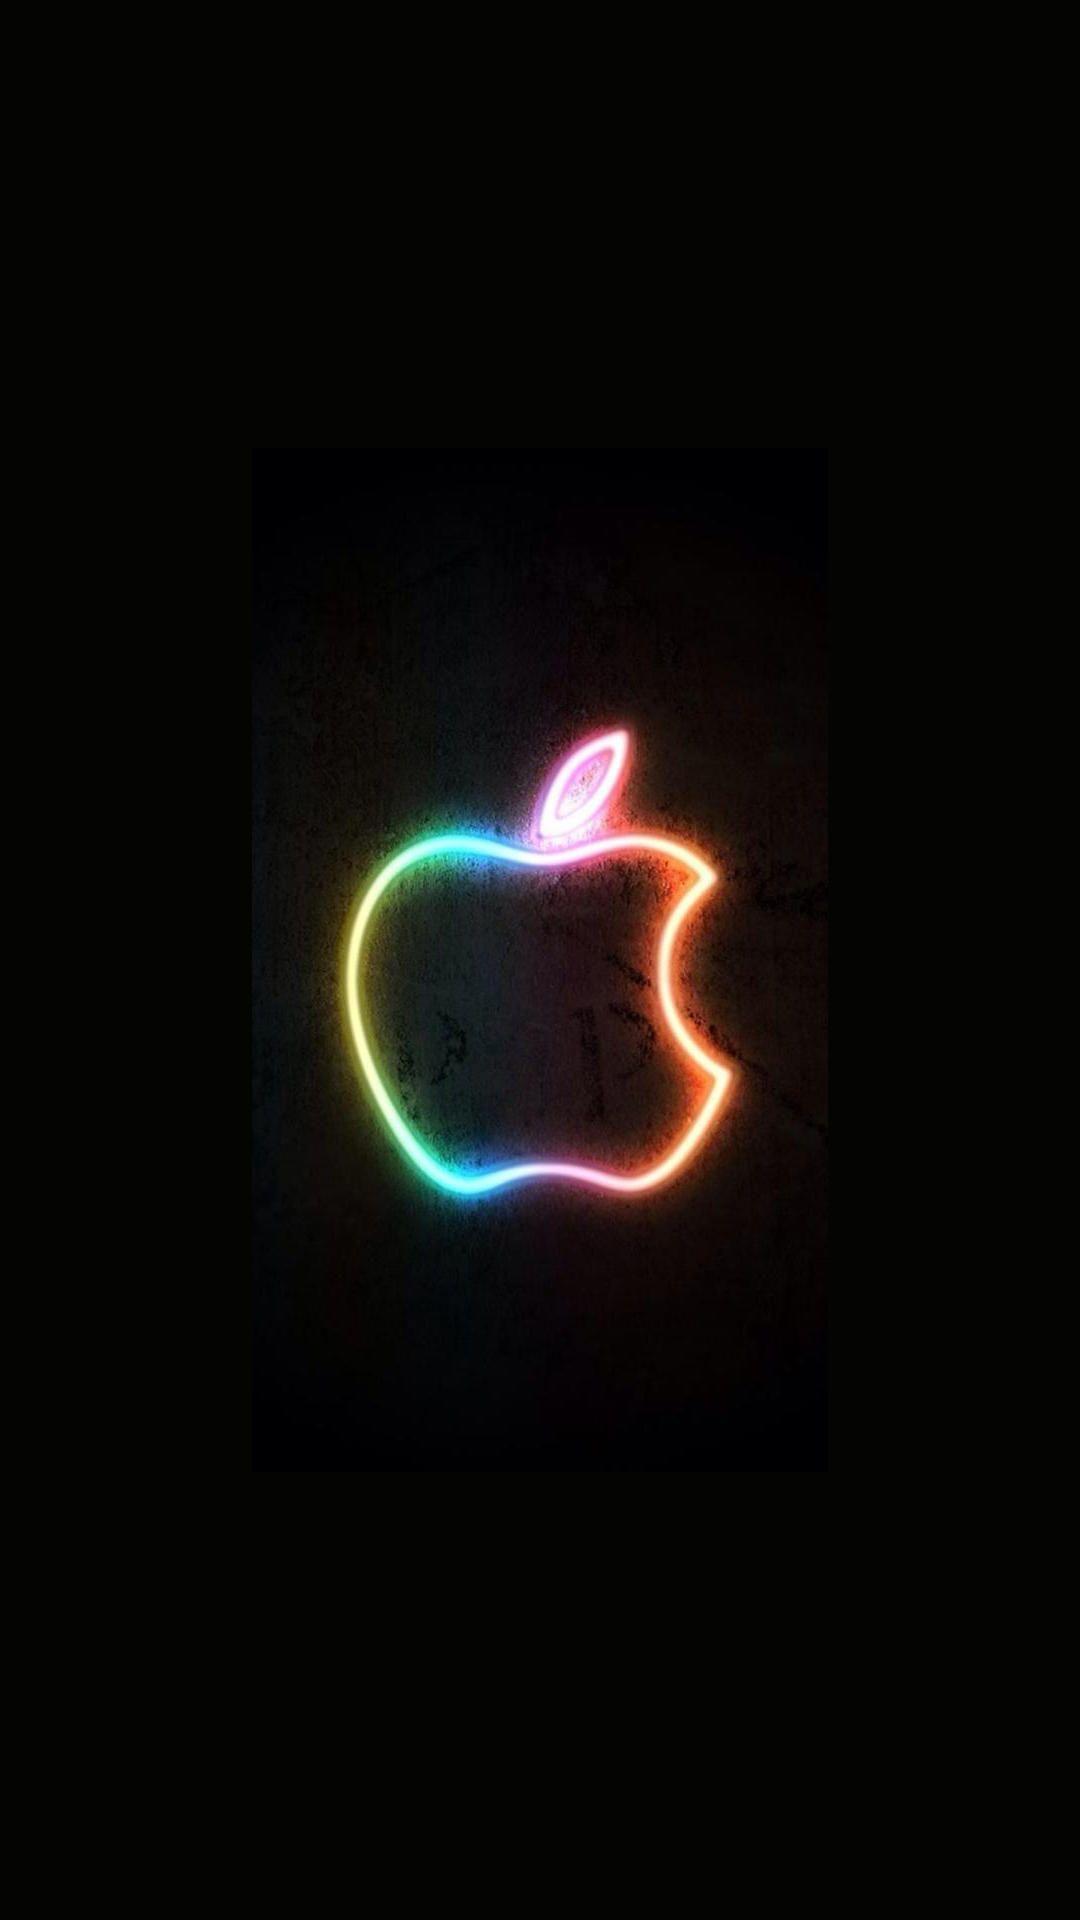 Apple Watch Face Apple logo. applewatch Apple watch